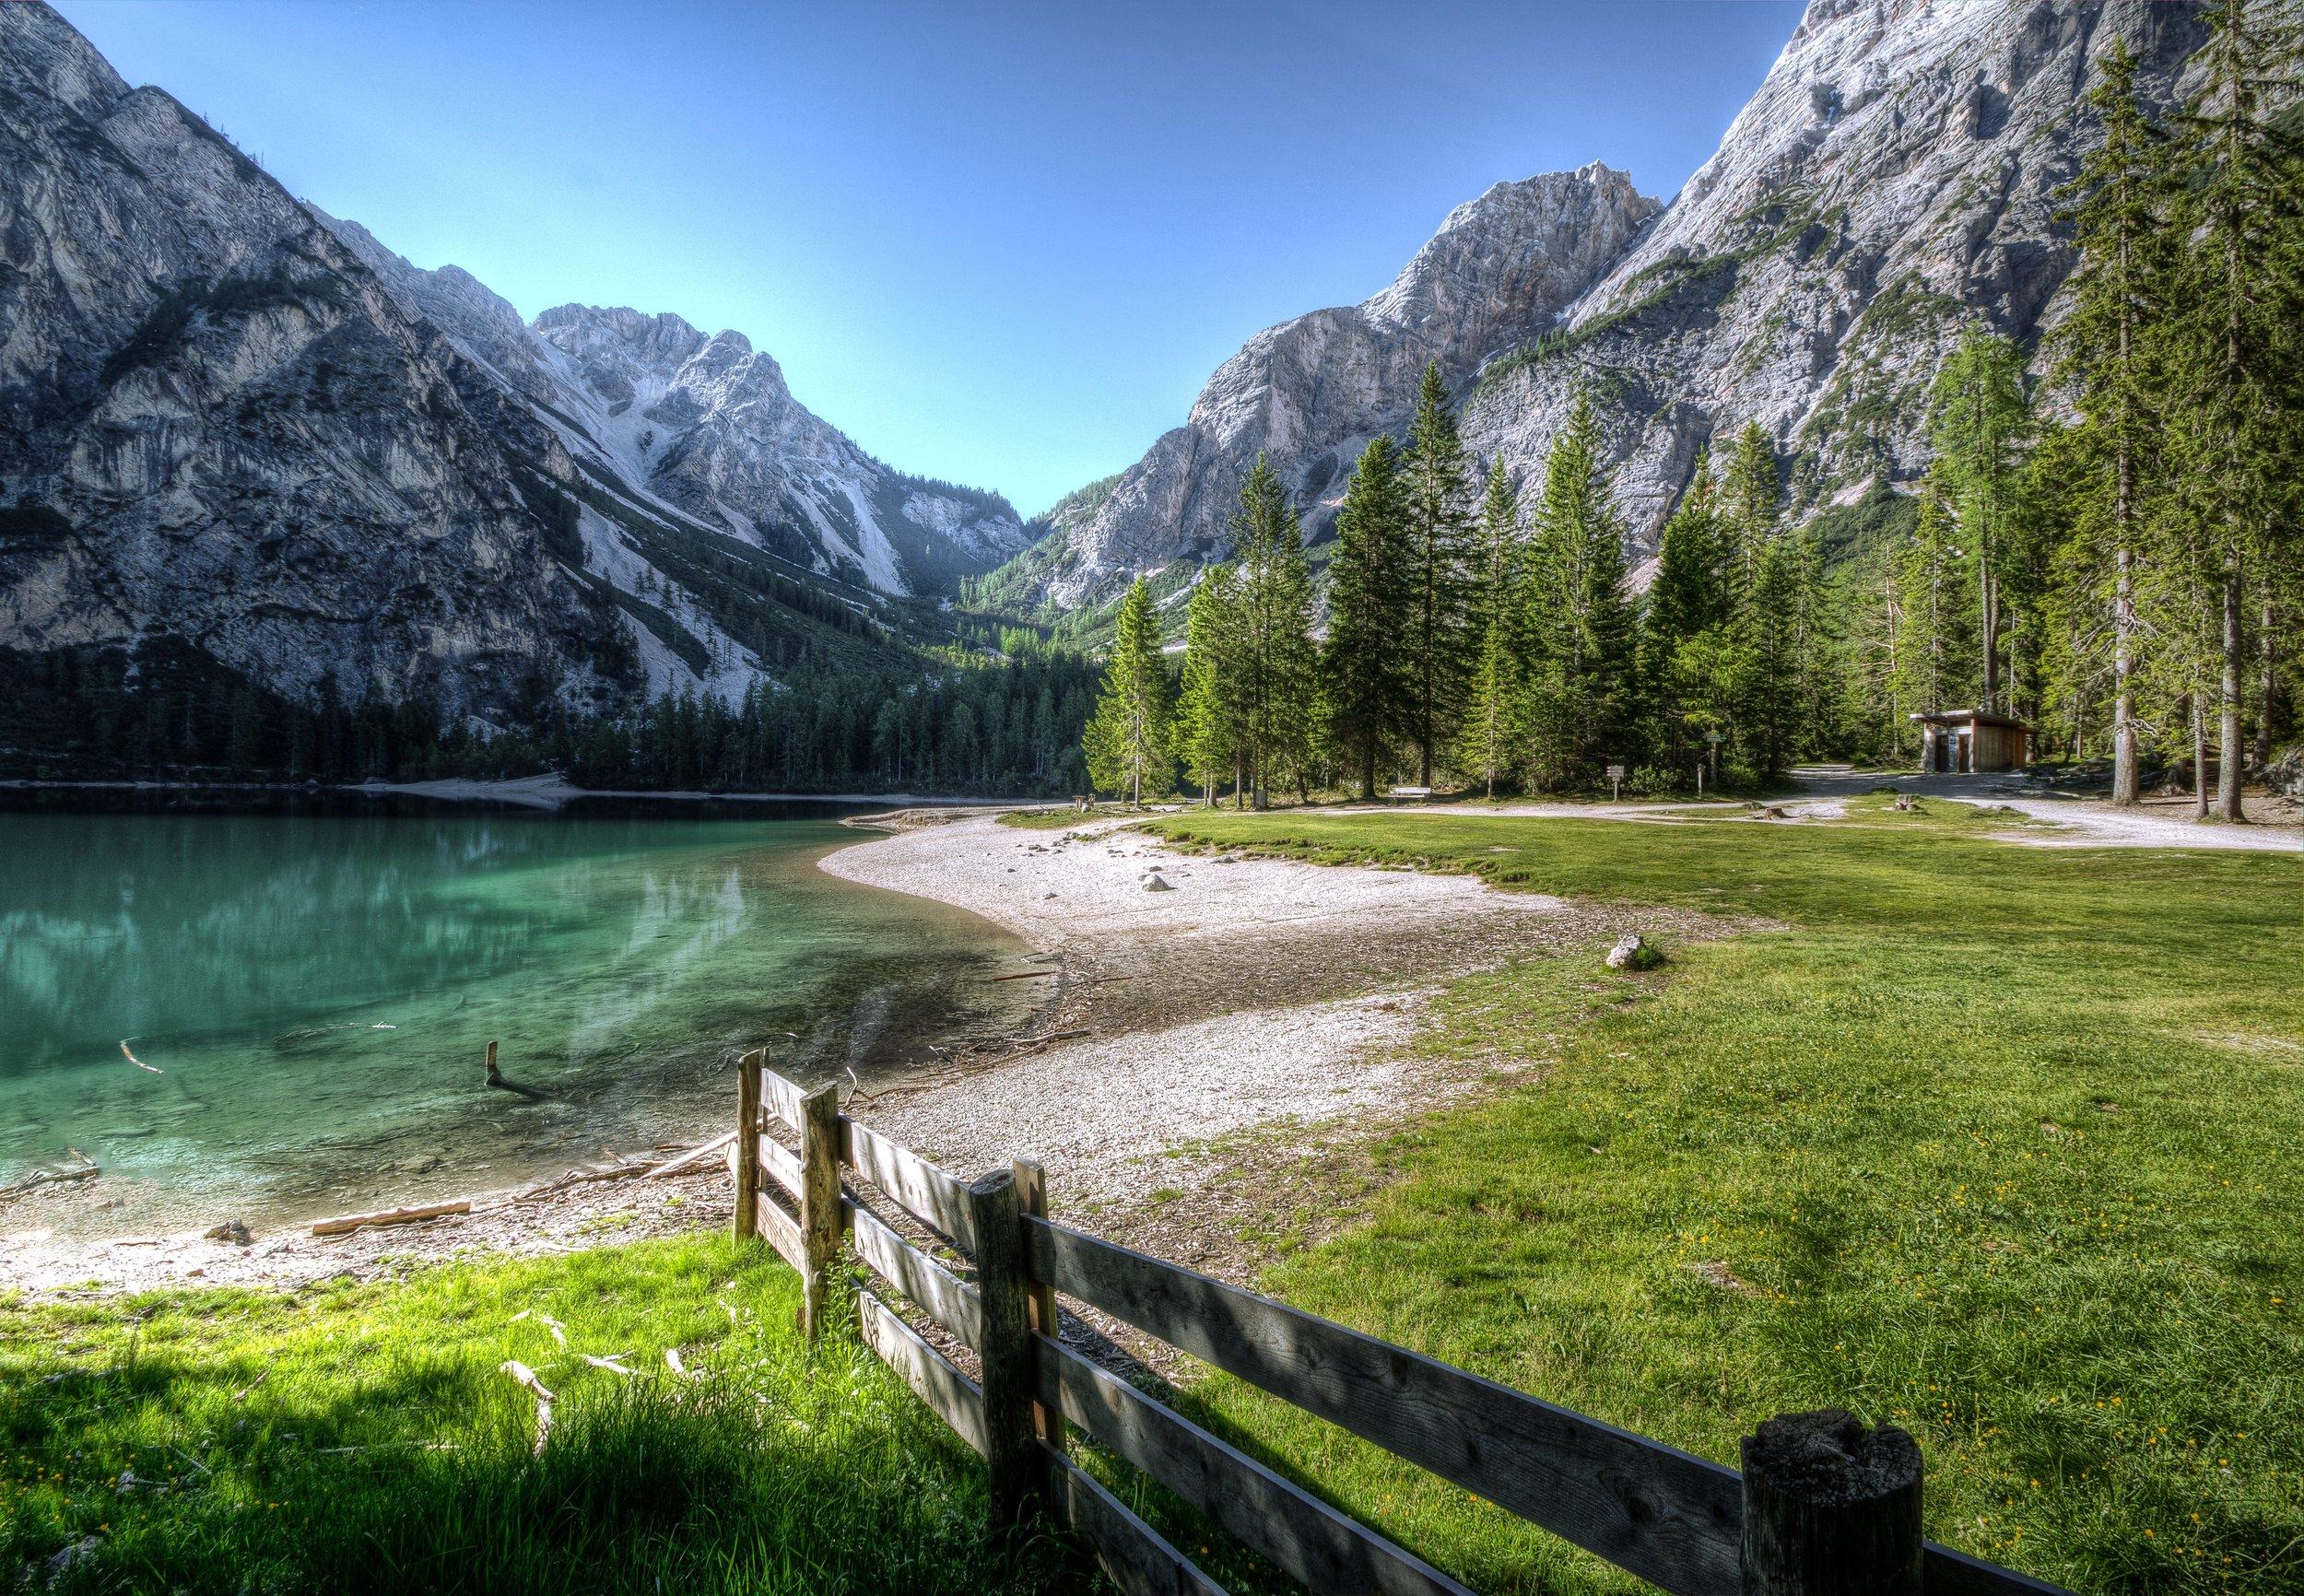 conifer-fence-grass-534164.jpg